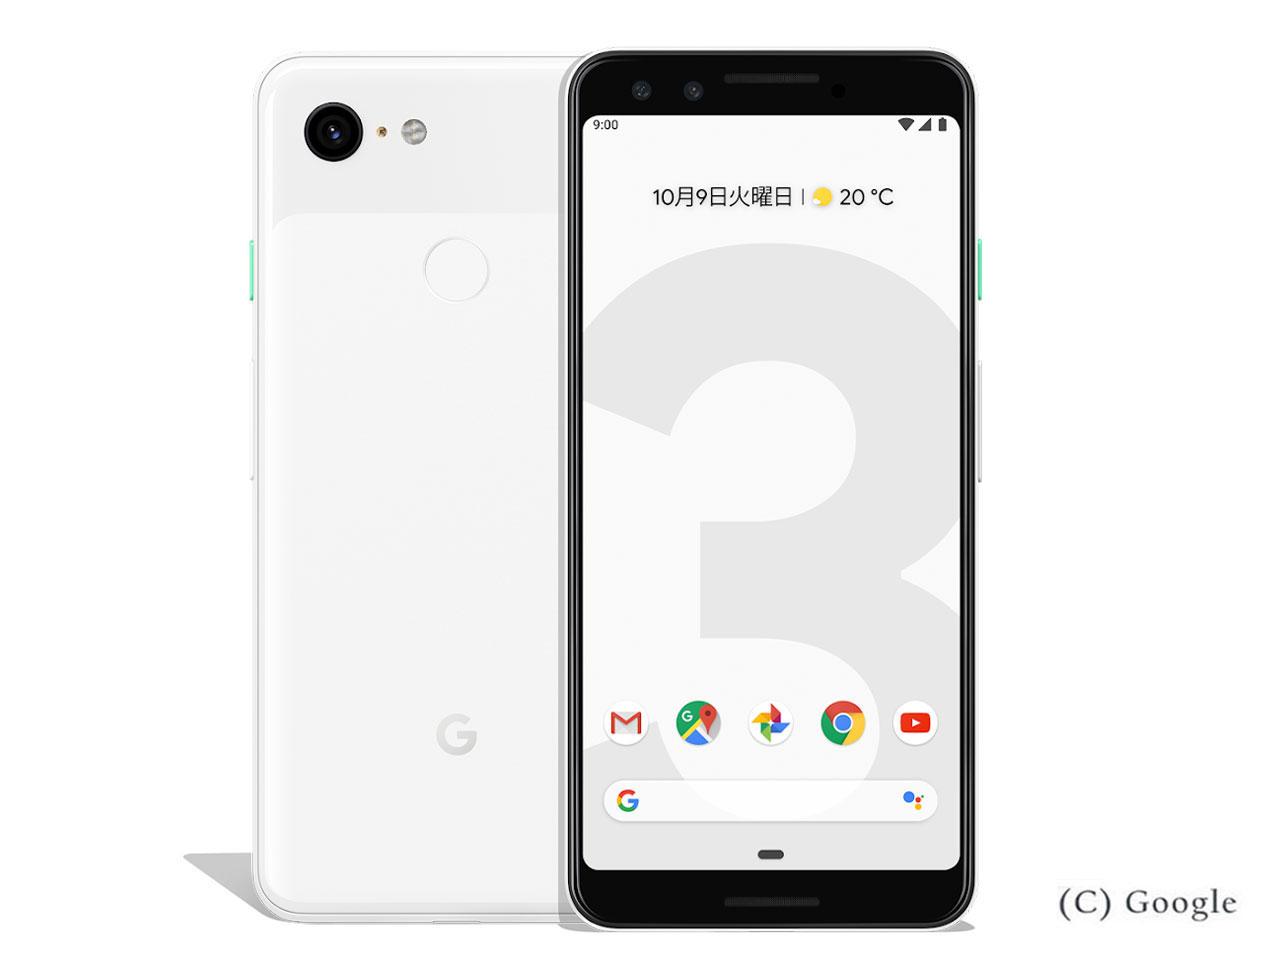 06f06a396f 日本市場で久々に発売となる、Googleが直接開発に携わったスマートフォンです。丁度良い大きさと軽さ、SDM845搭載のハイエンド機のトレンドを全てではないものの一通り  ...